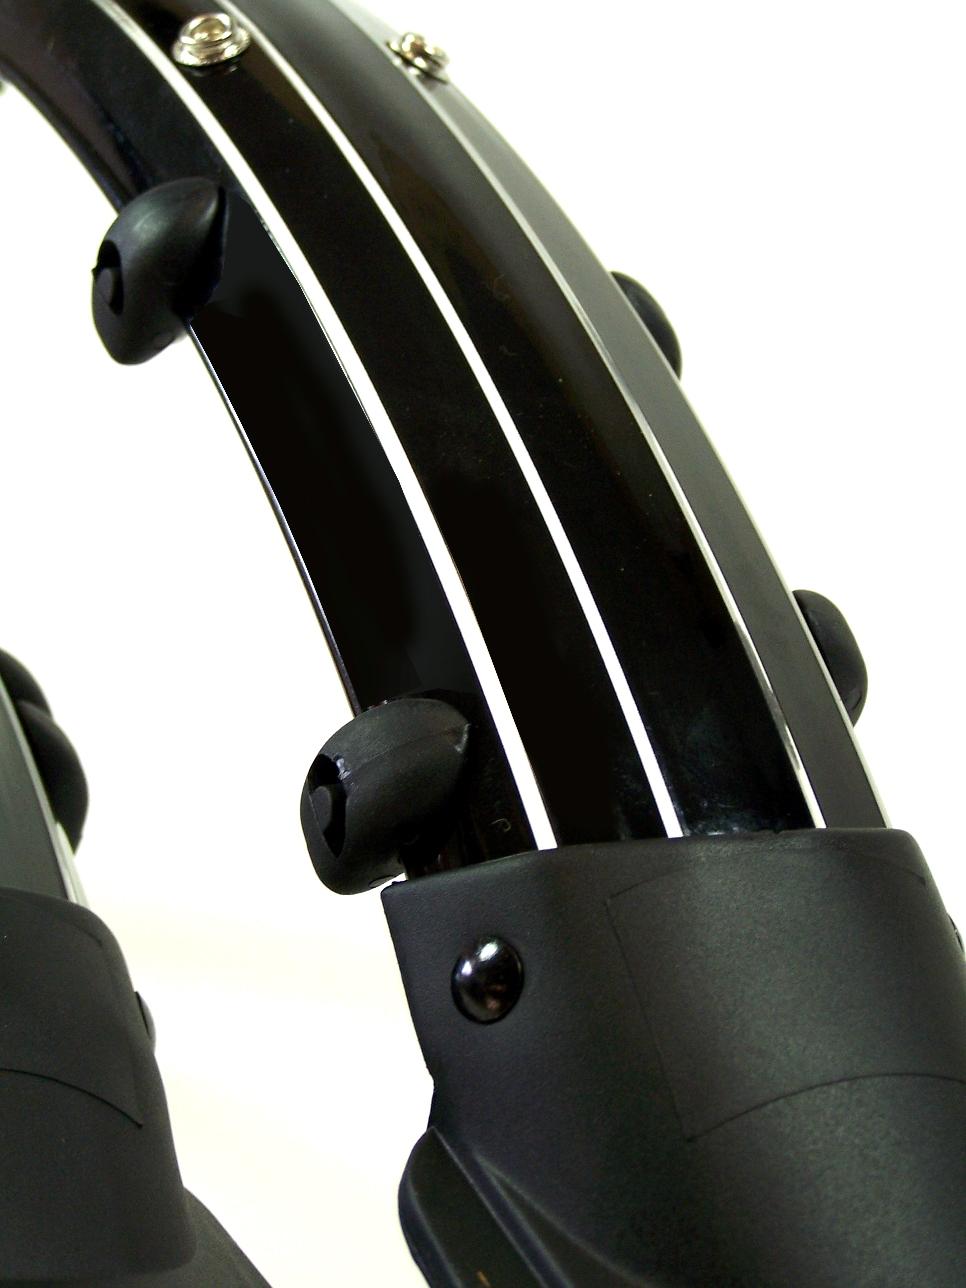 2x fahrrad schutzblech schwarz 20 24 26 28 zoll f r. Black Bedroom Furniture Sets. Home Design Ideas